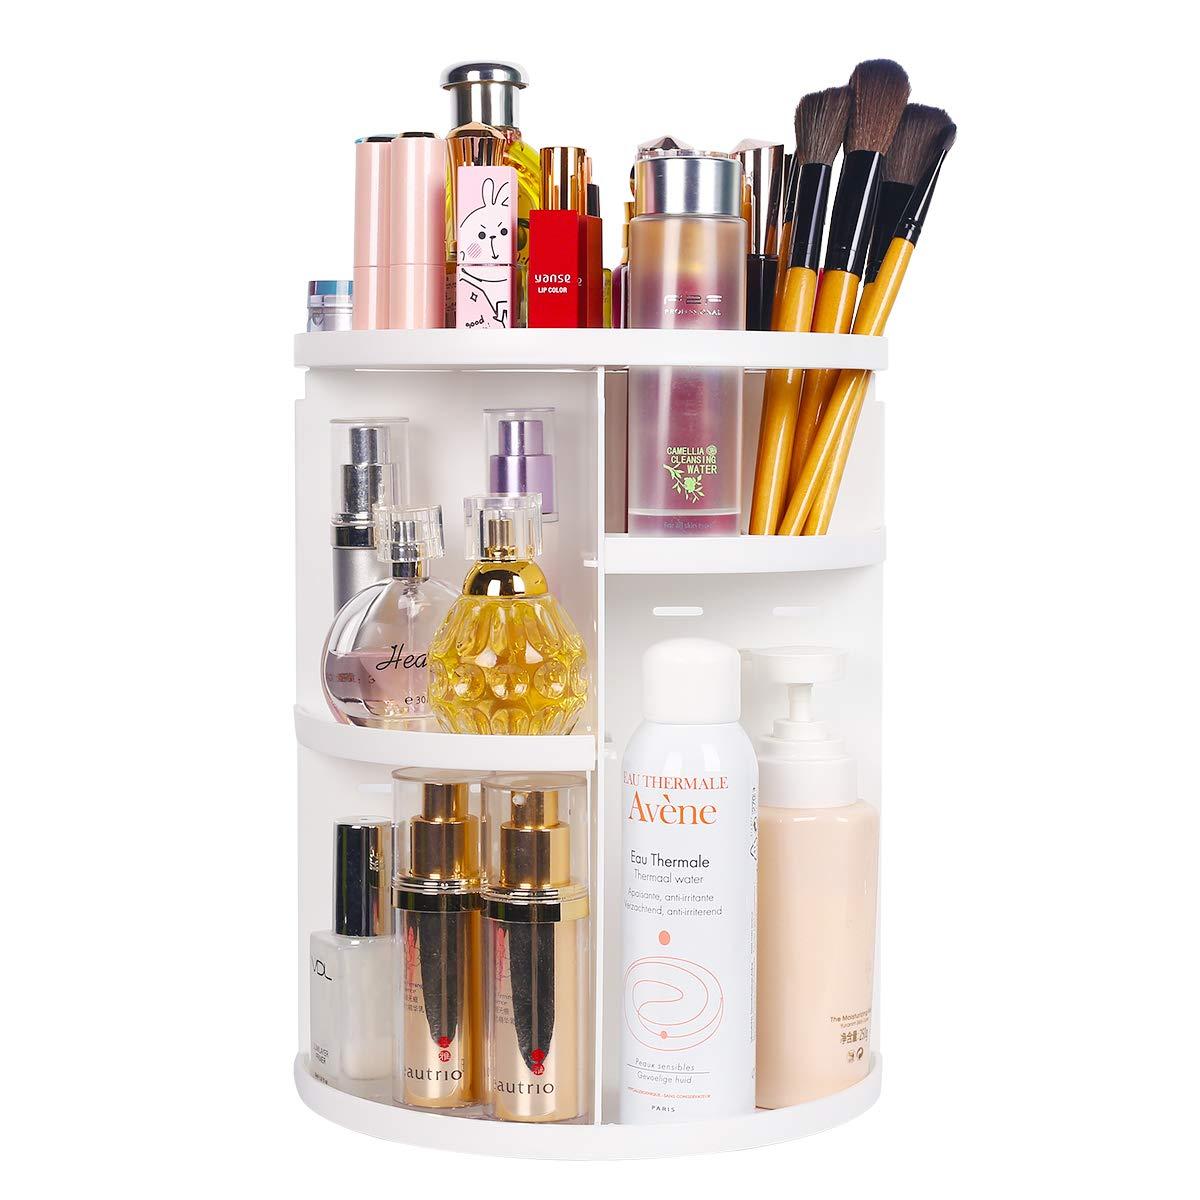 Amazon Com Sanipoe 360 Makeup Organizer Diy Detachable Spinning Cosmetic Makeup Caddy Storage Display Bag Case Large Capacity Makeup Box Acrylic Vanity Organizer Box Great For Countertop And Bathroom White Beauty